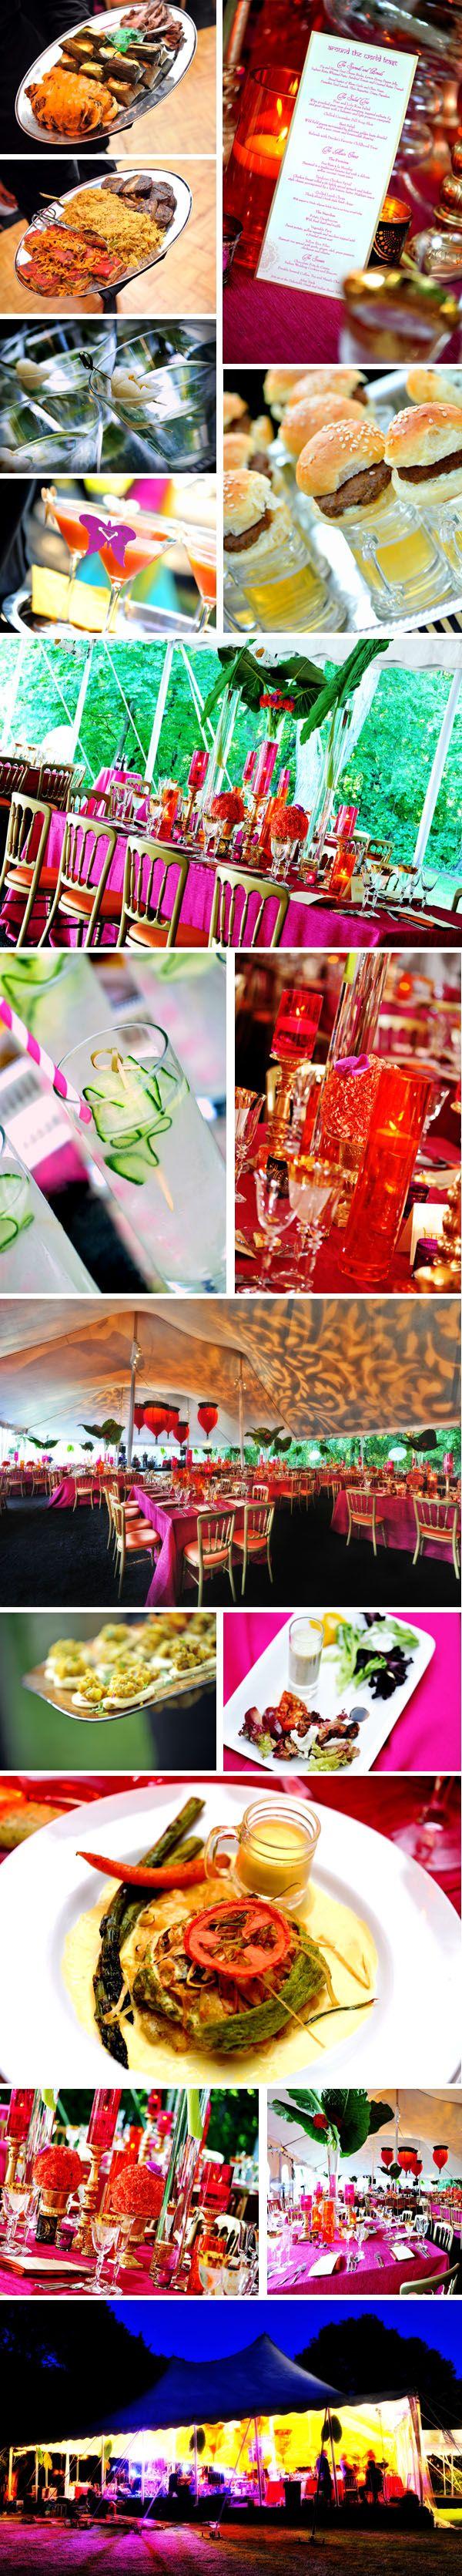 Entertaining Company www.entertainingcompany.com and Jai-Girard-Indian-Wedding-Reception | StrictlyWeddings.com